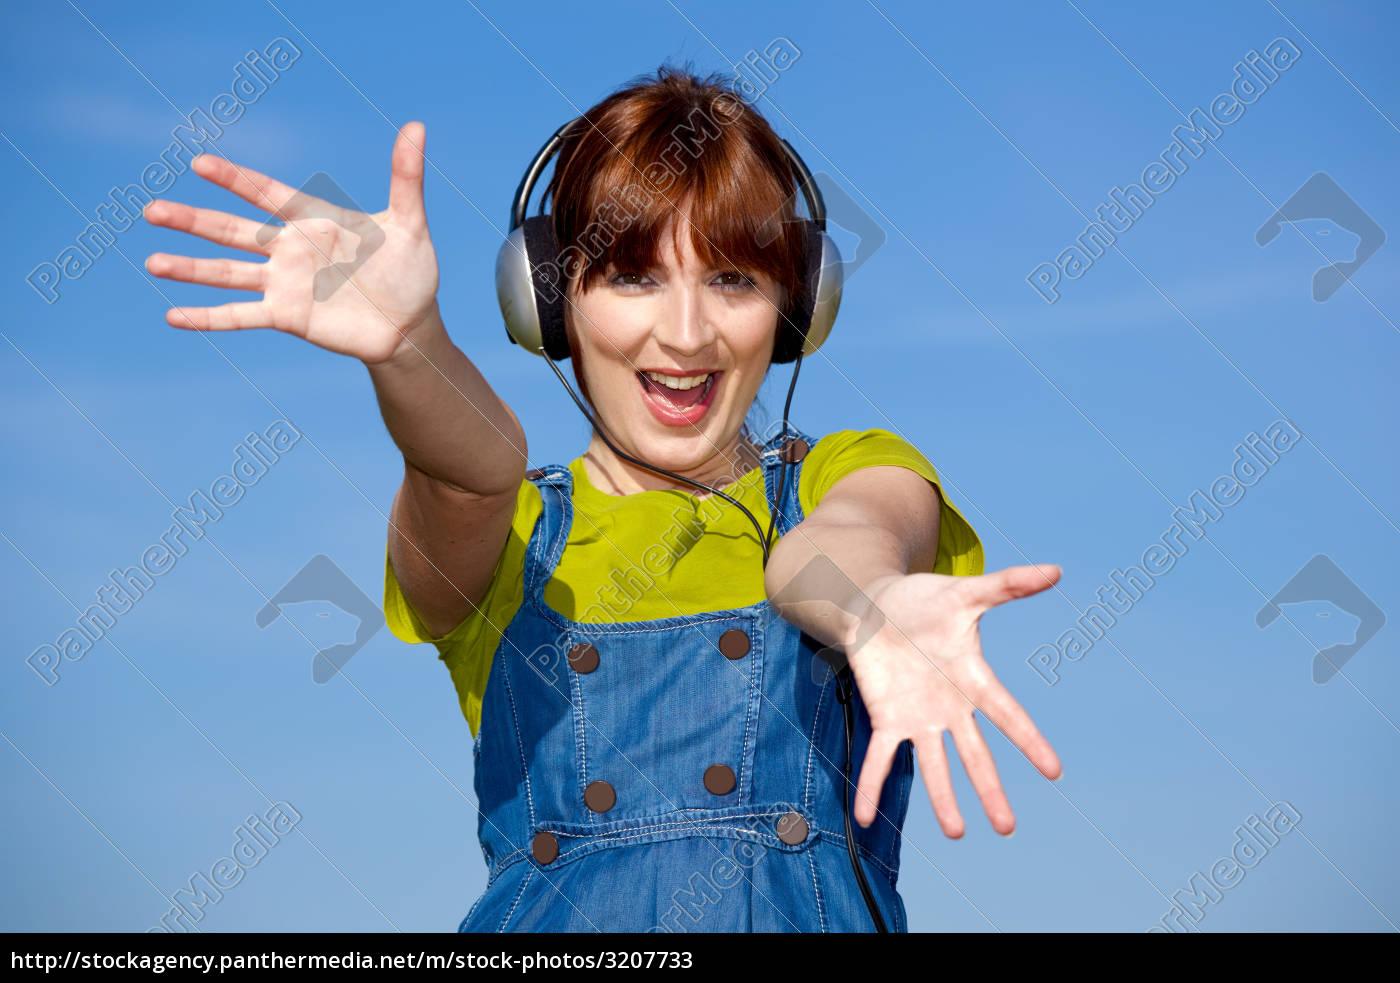 woman, music, spring, bouncing, bounces, hop - 3207733